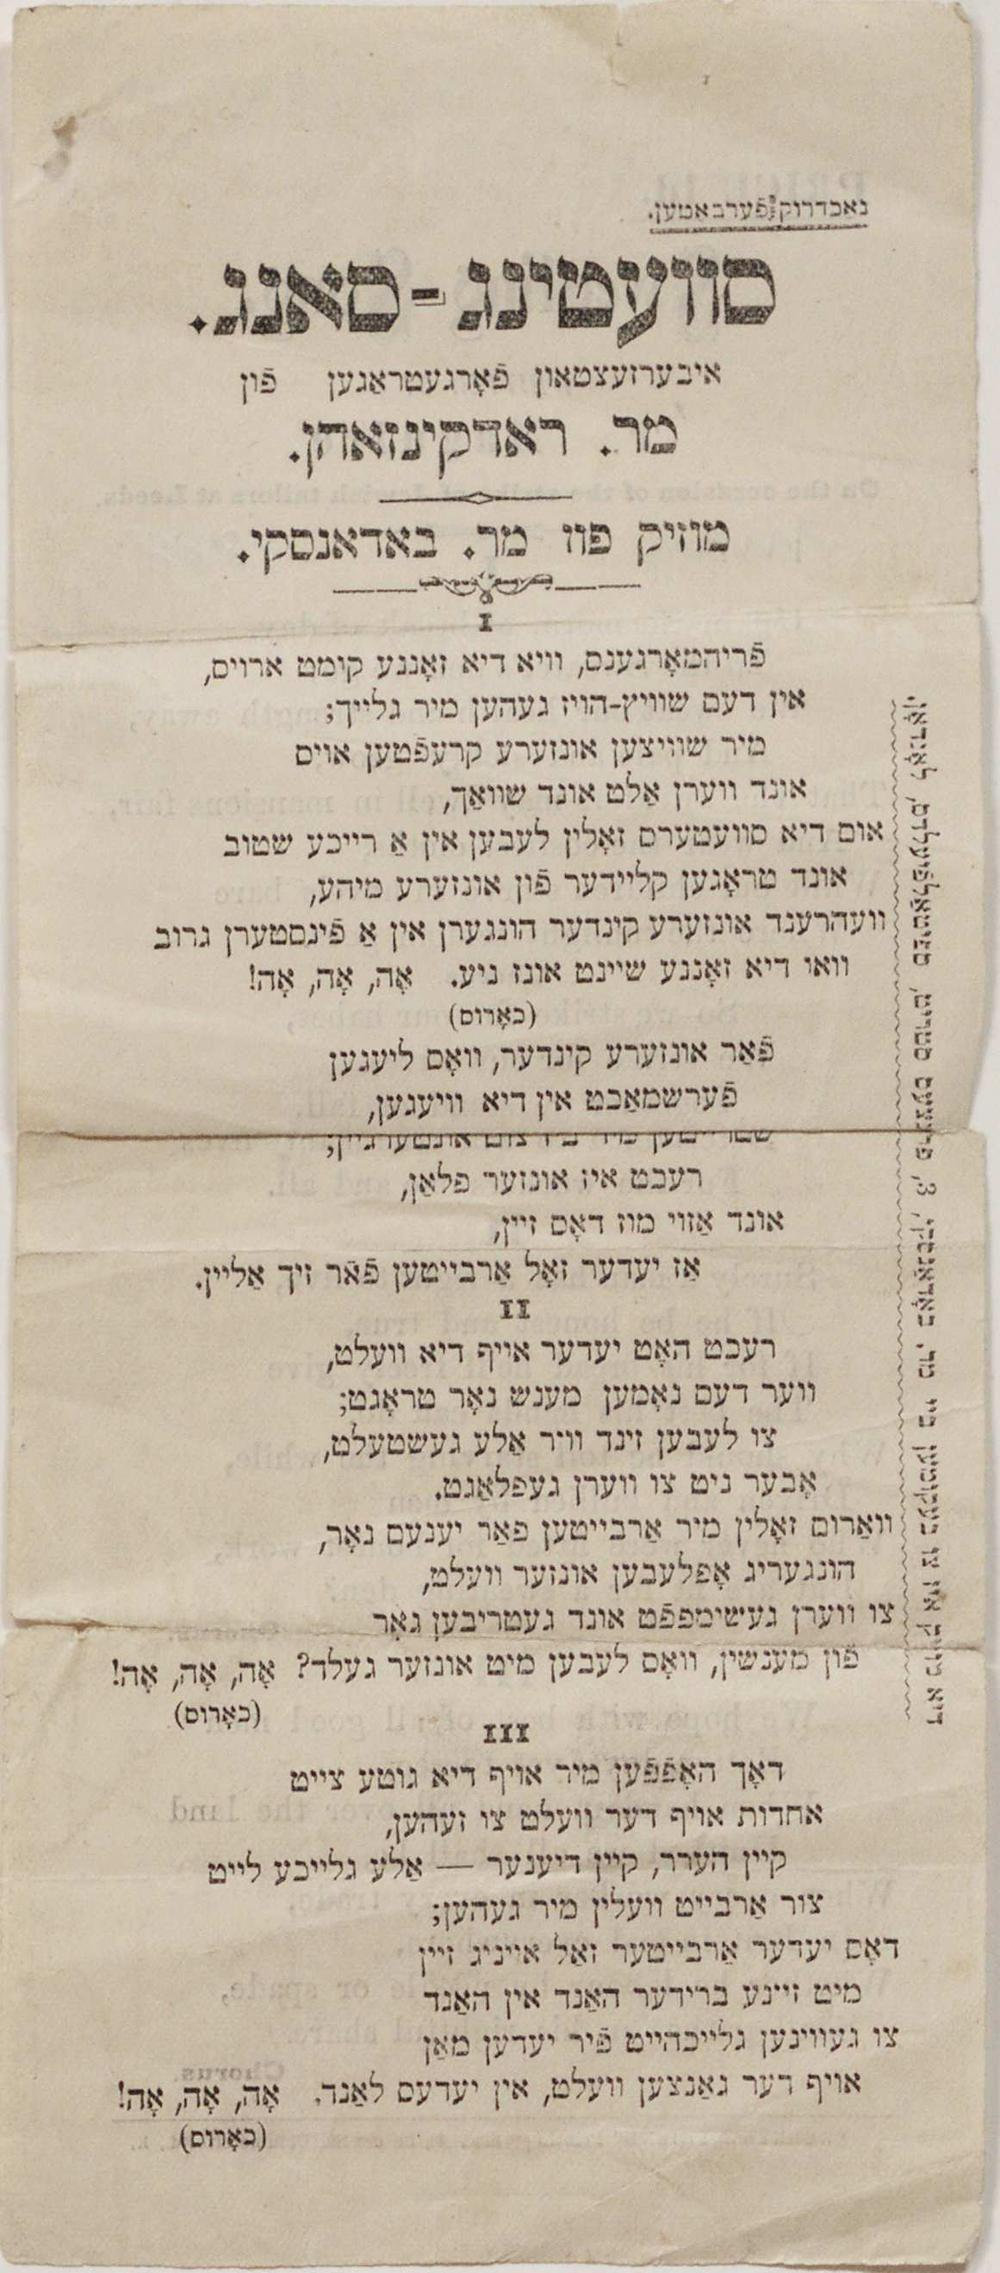 Yiddish for sweating